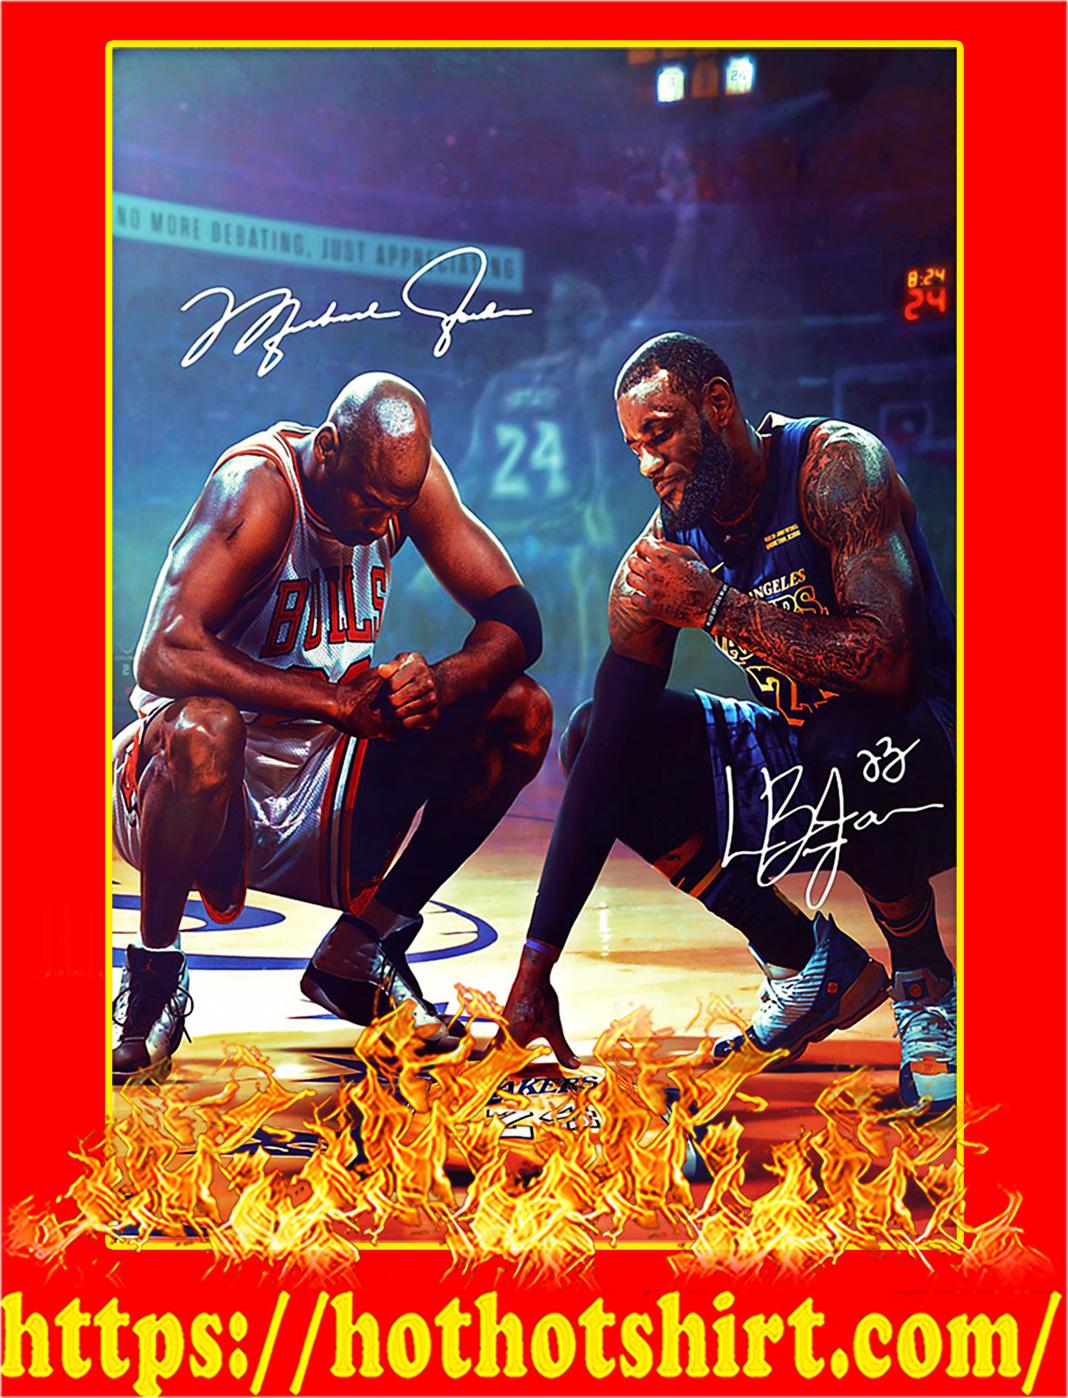 Michael jordan and lebron james poster - A1